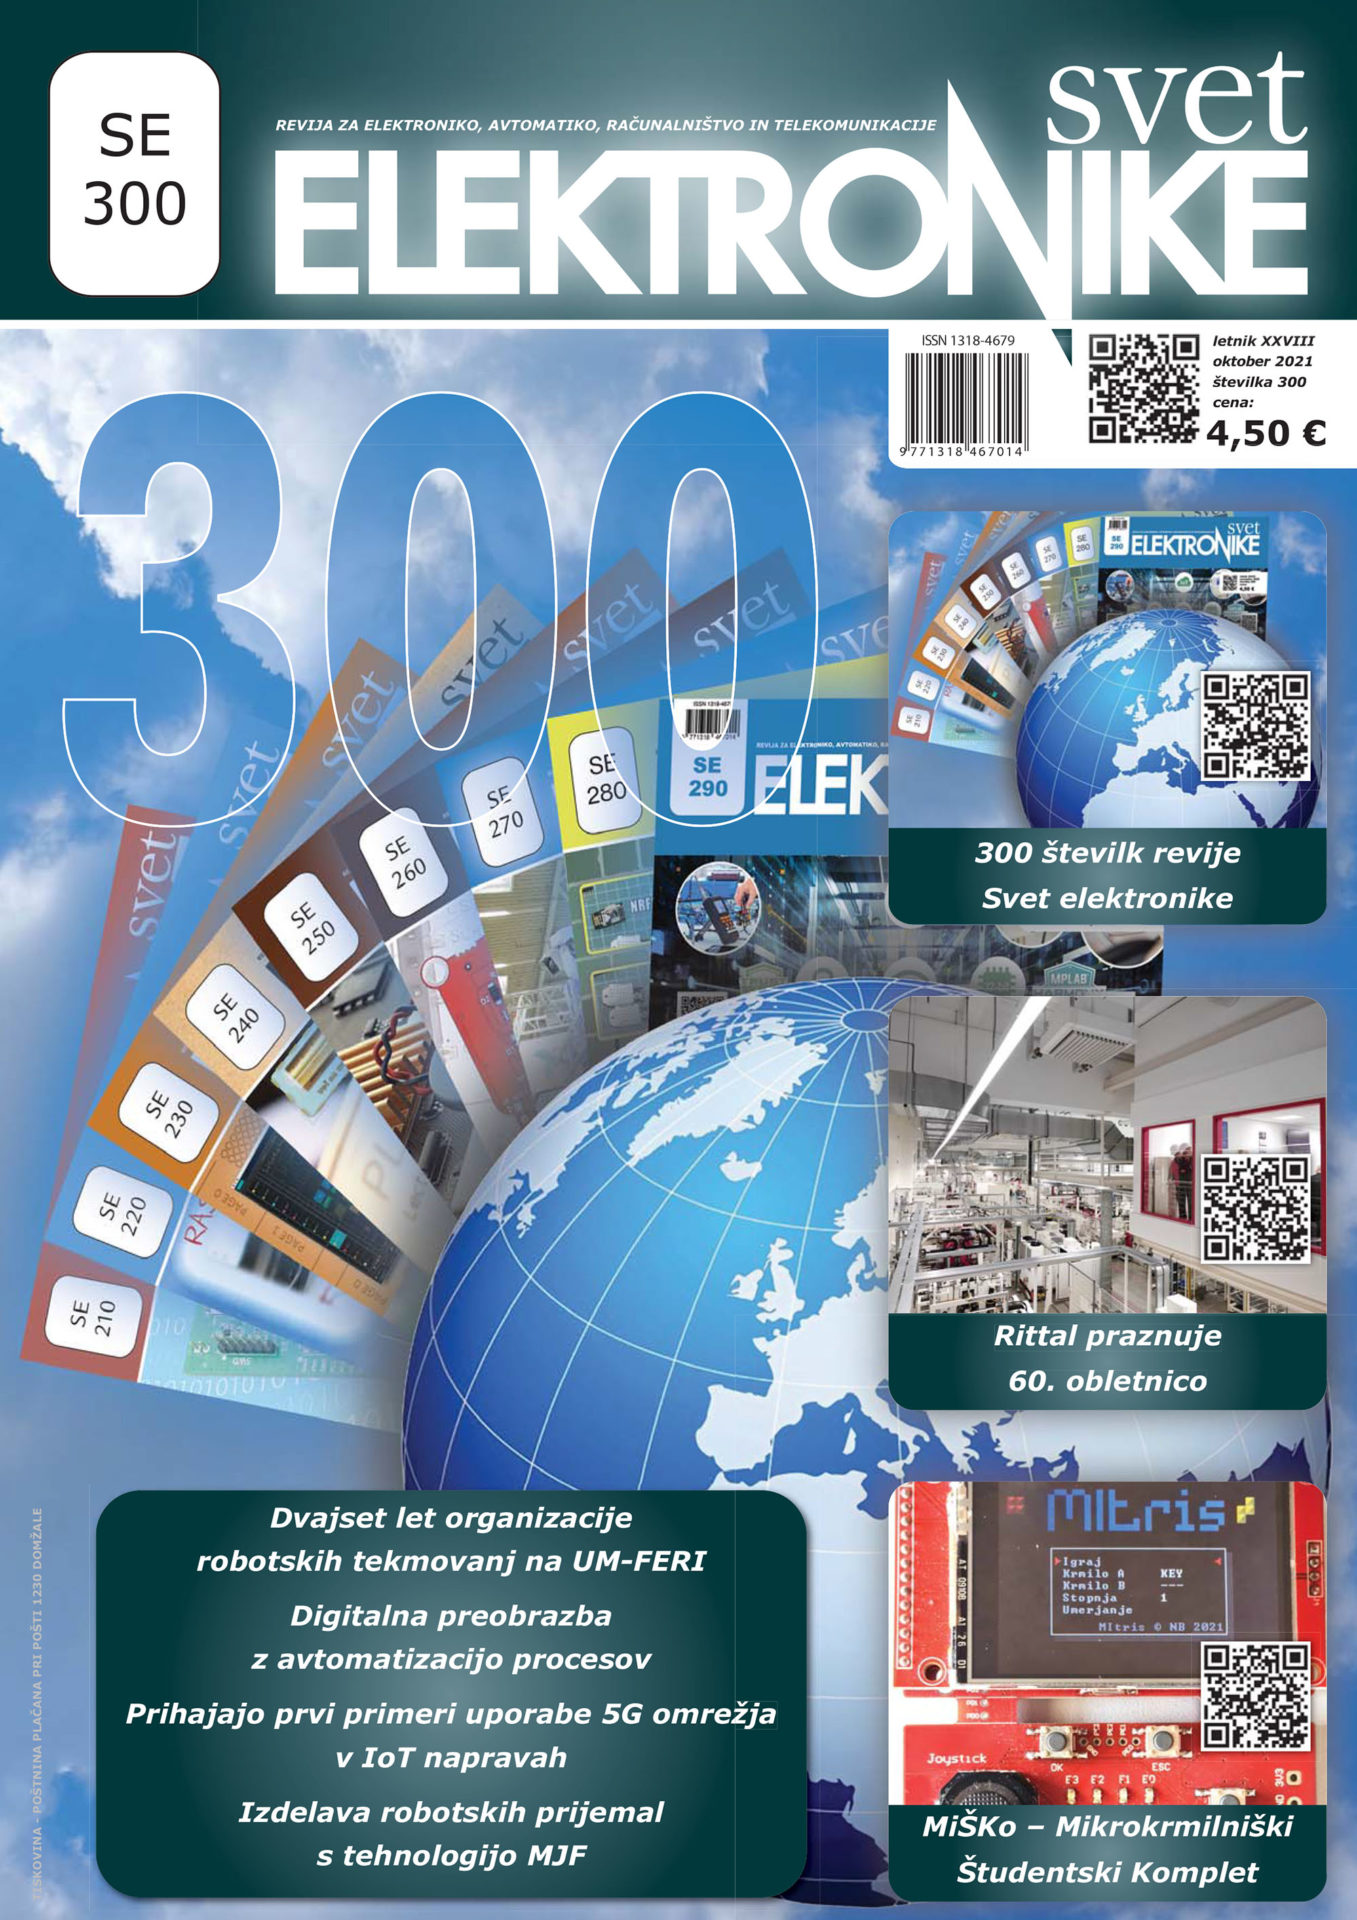 300 1 - Revija PDF SE 300 oktober 2021